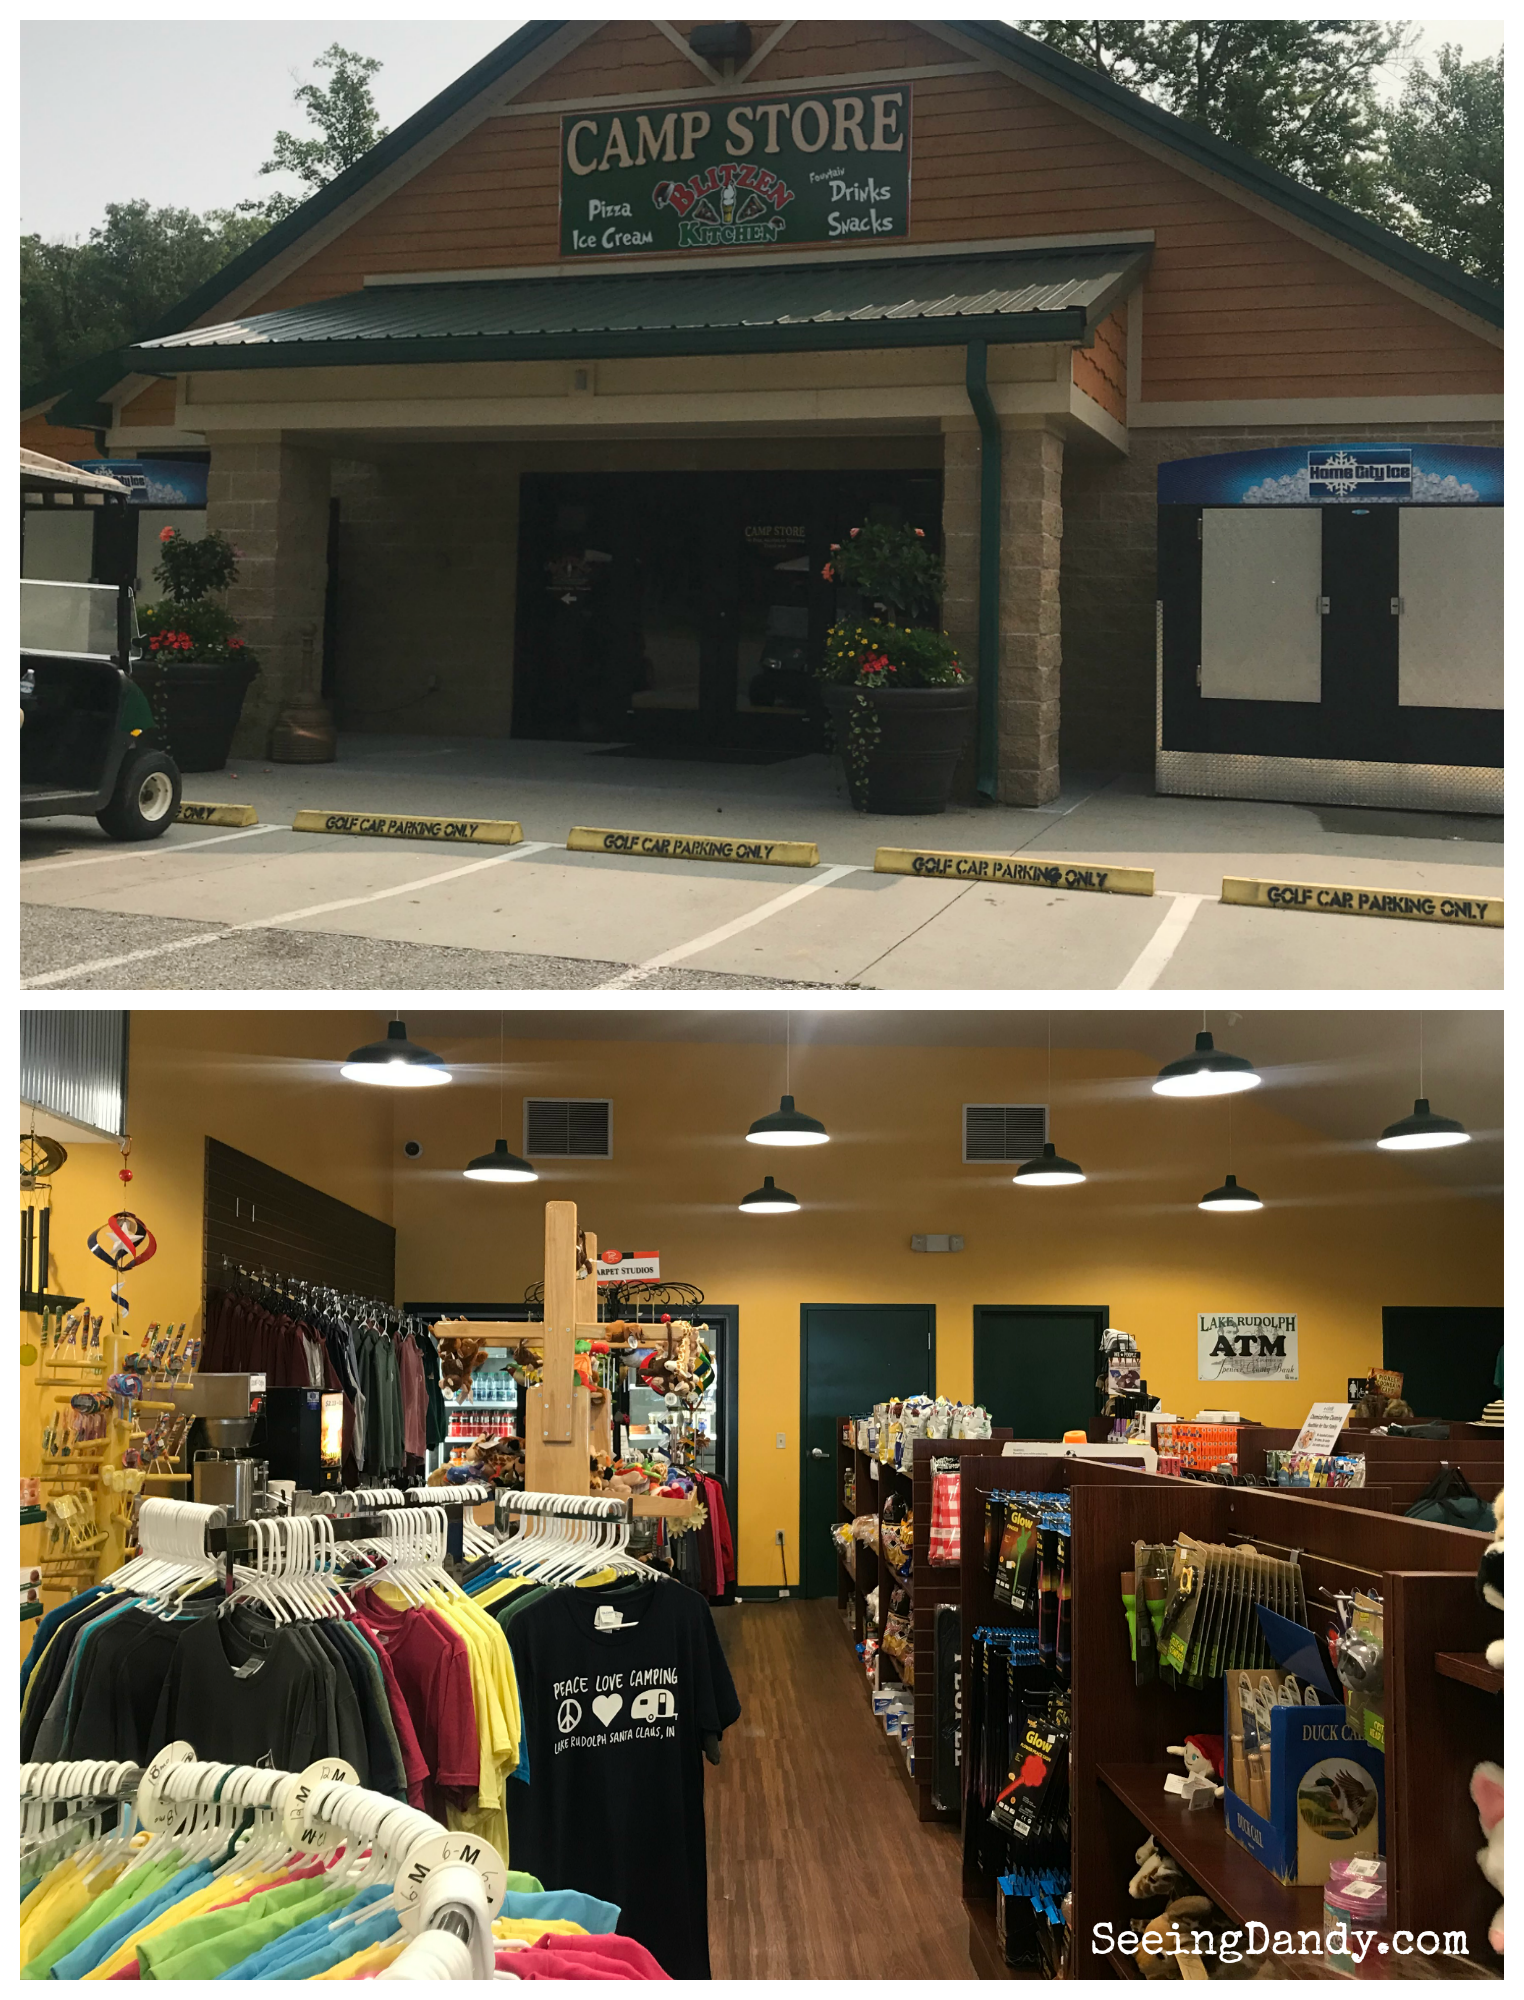 Lake Rudolph camp store.